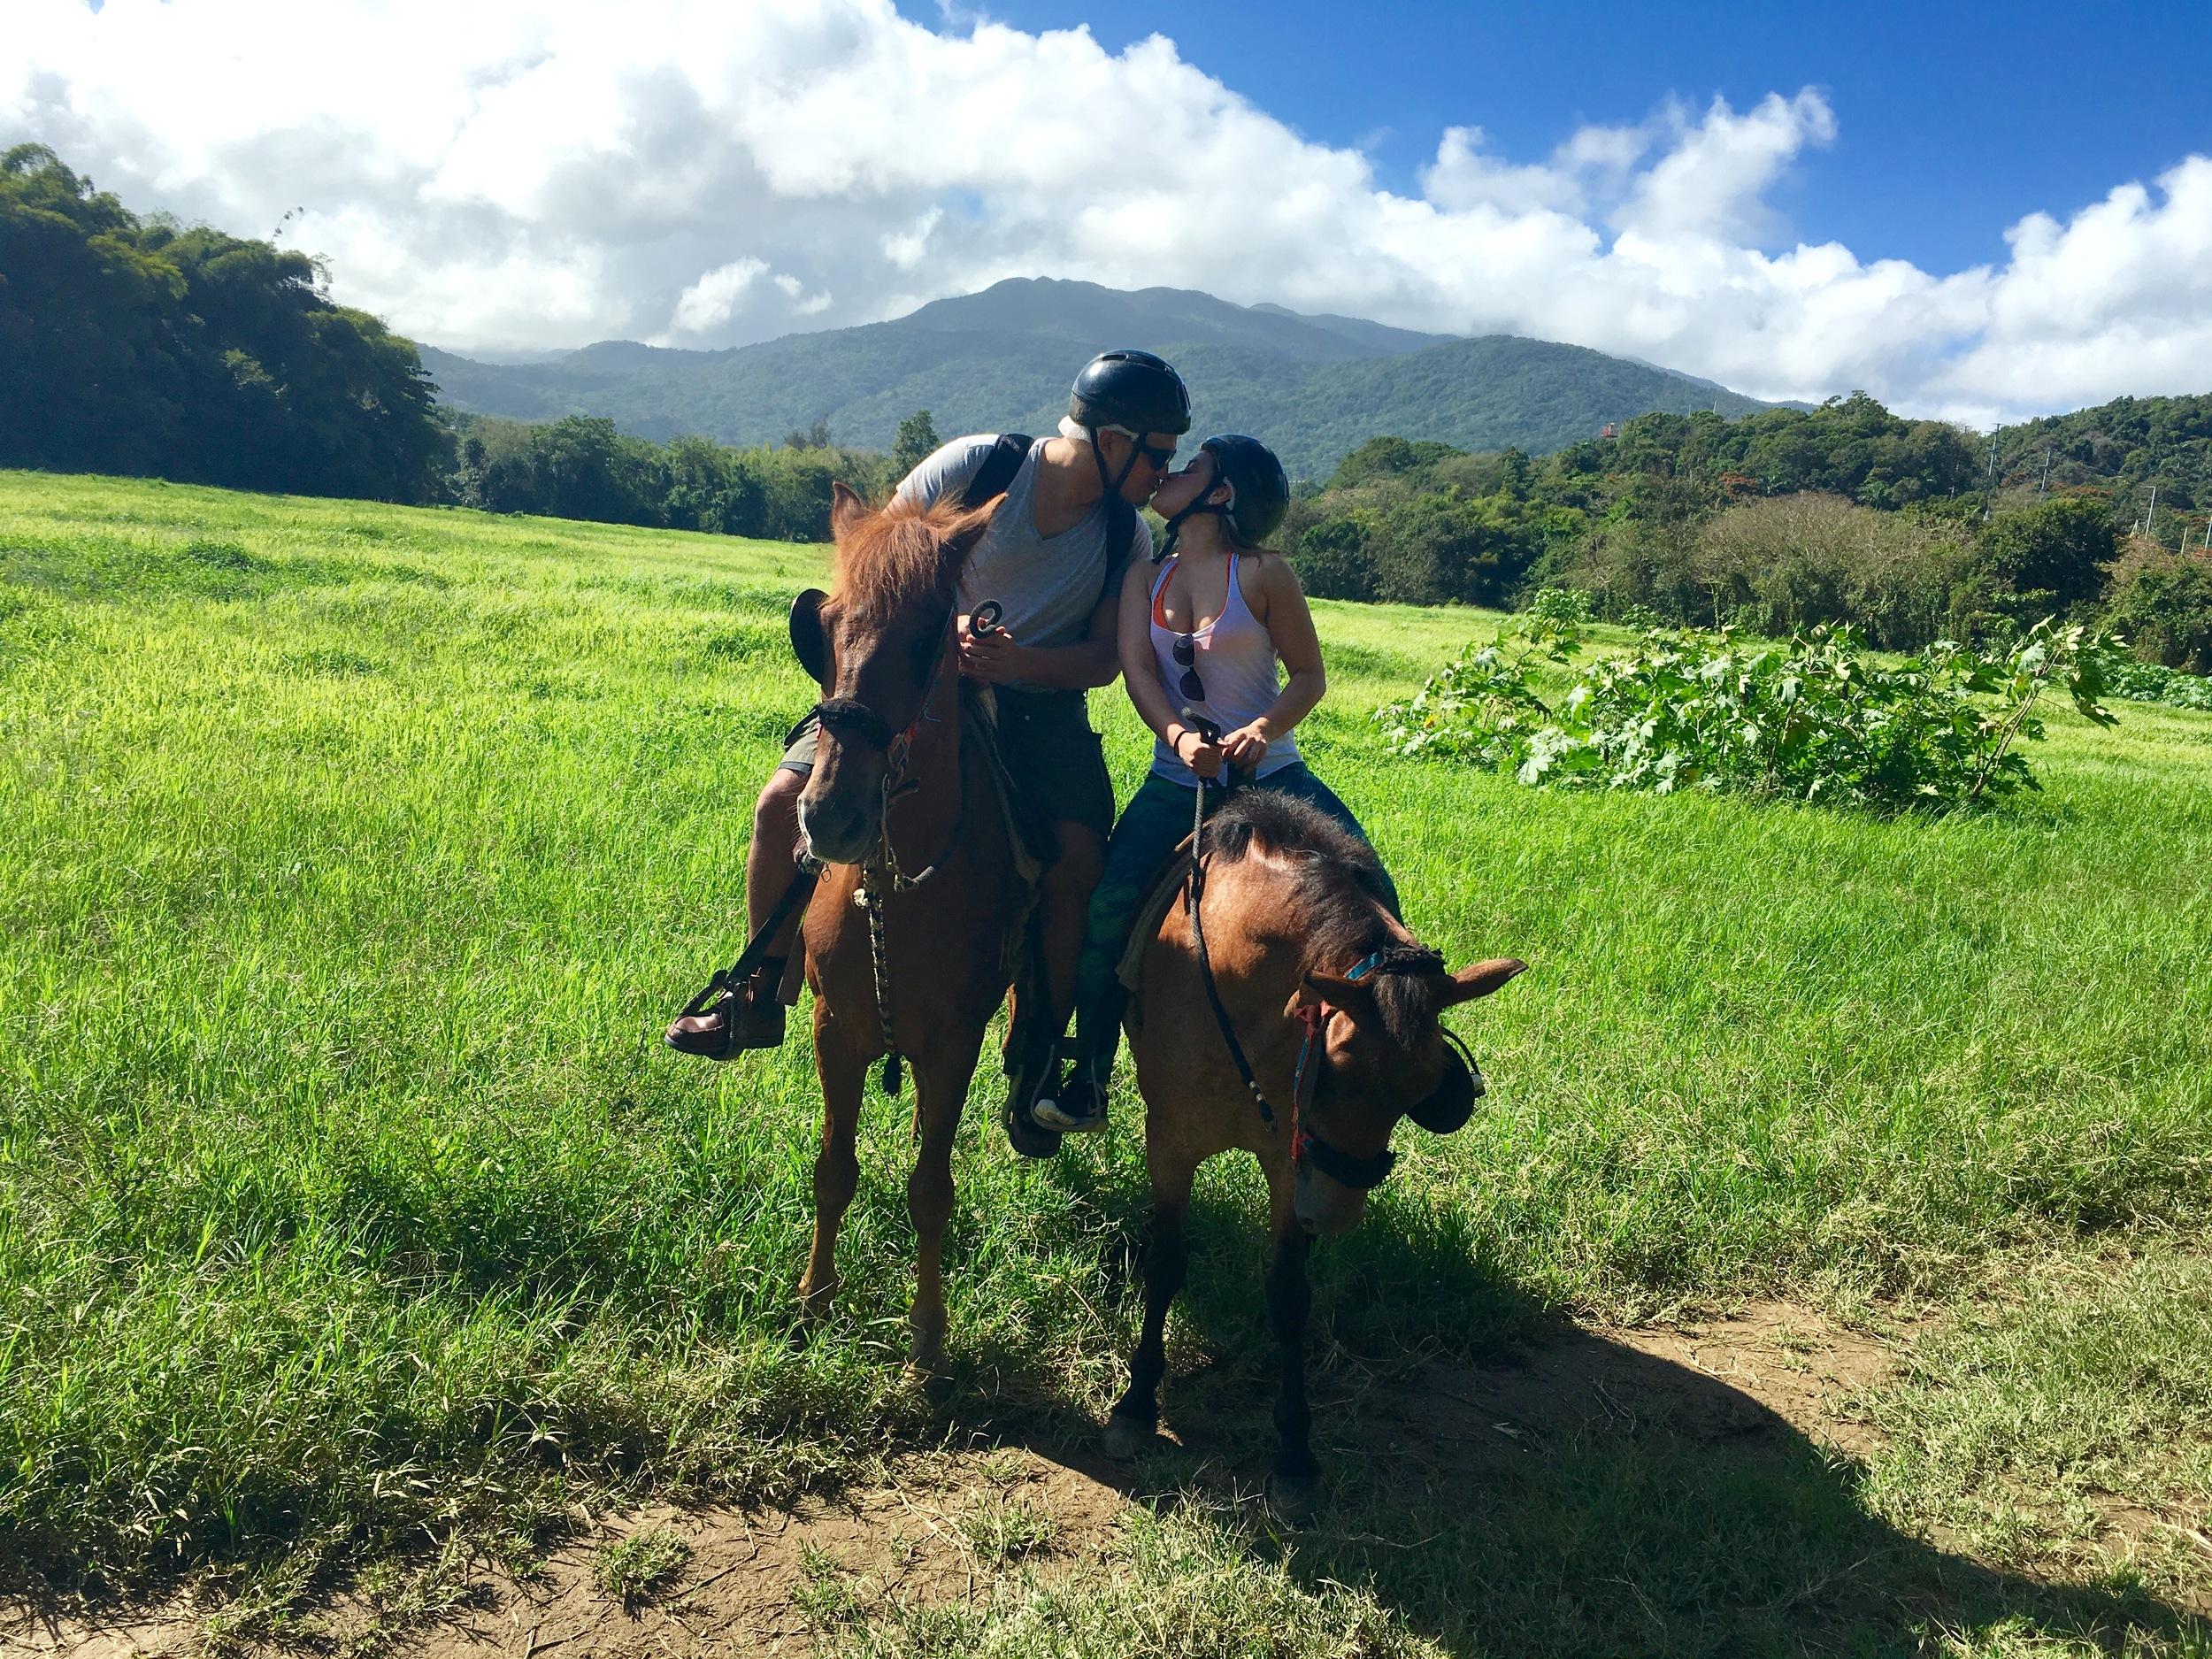 Horseback riding in Puerto Rico!